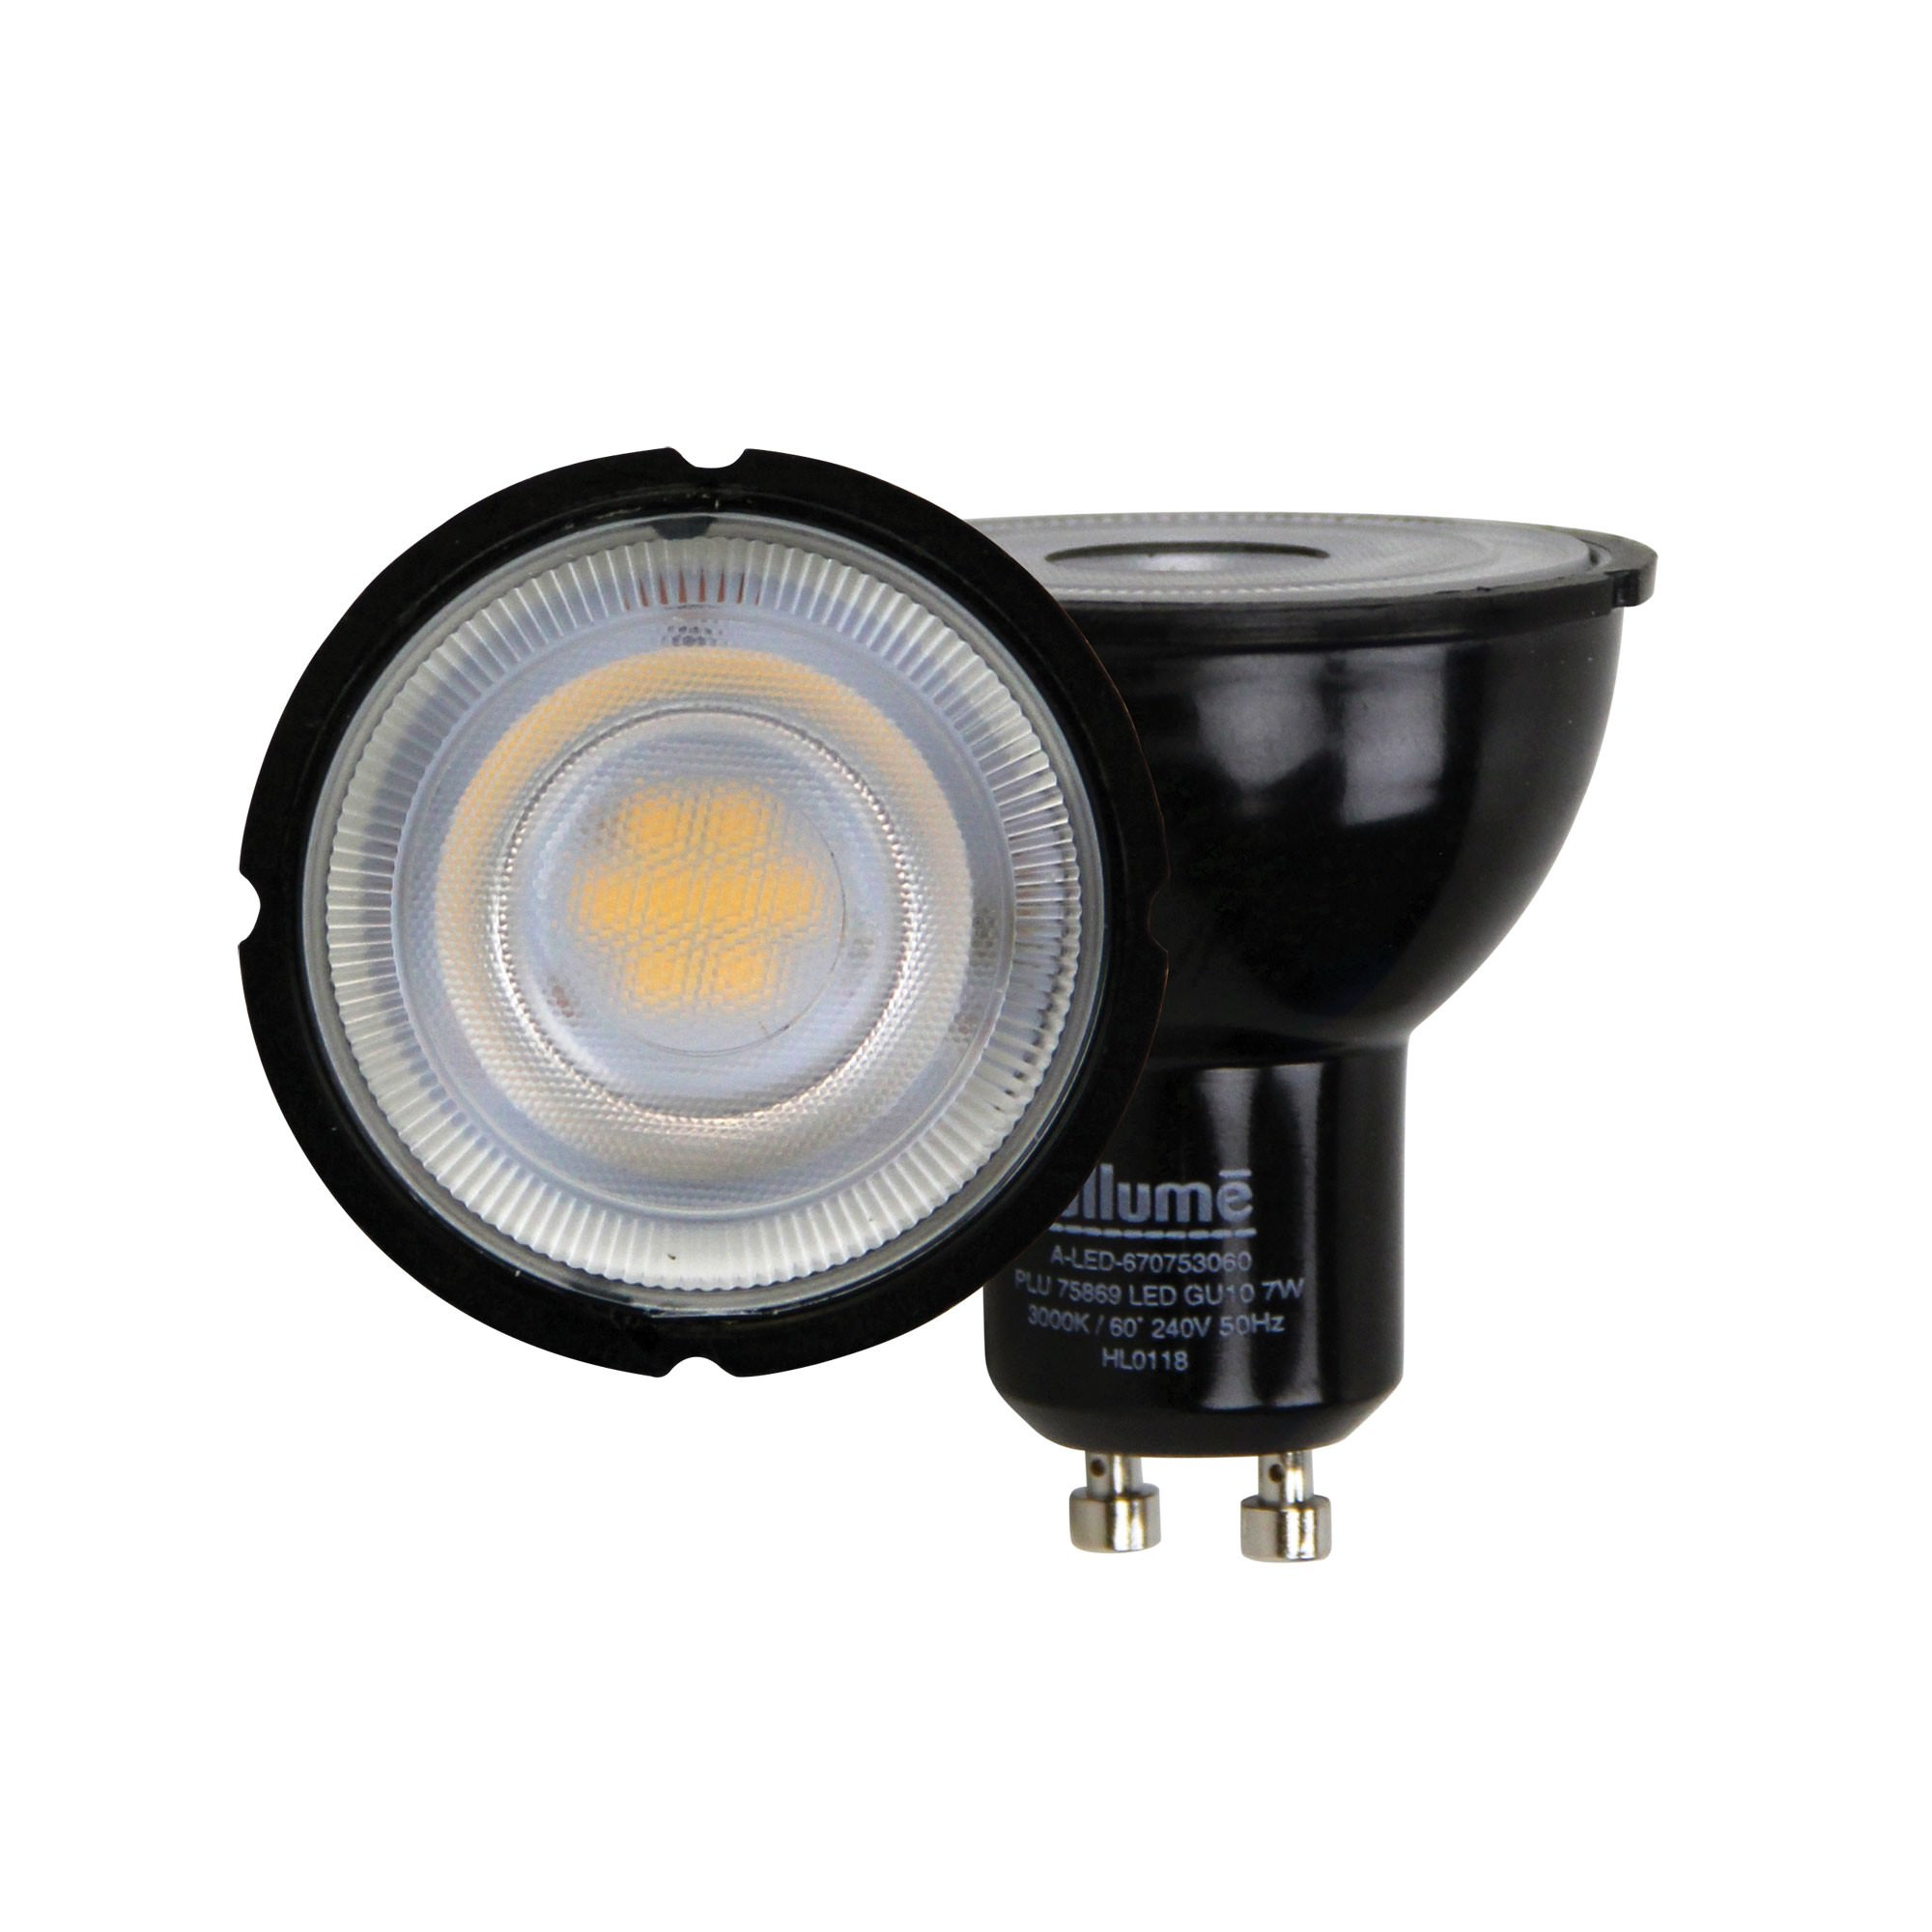 Allume LED Globe, 7W, GU10, 5000K, Black